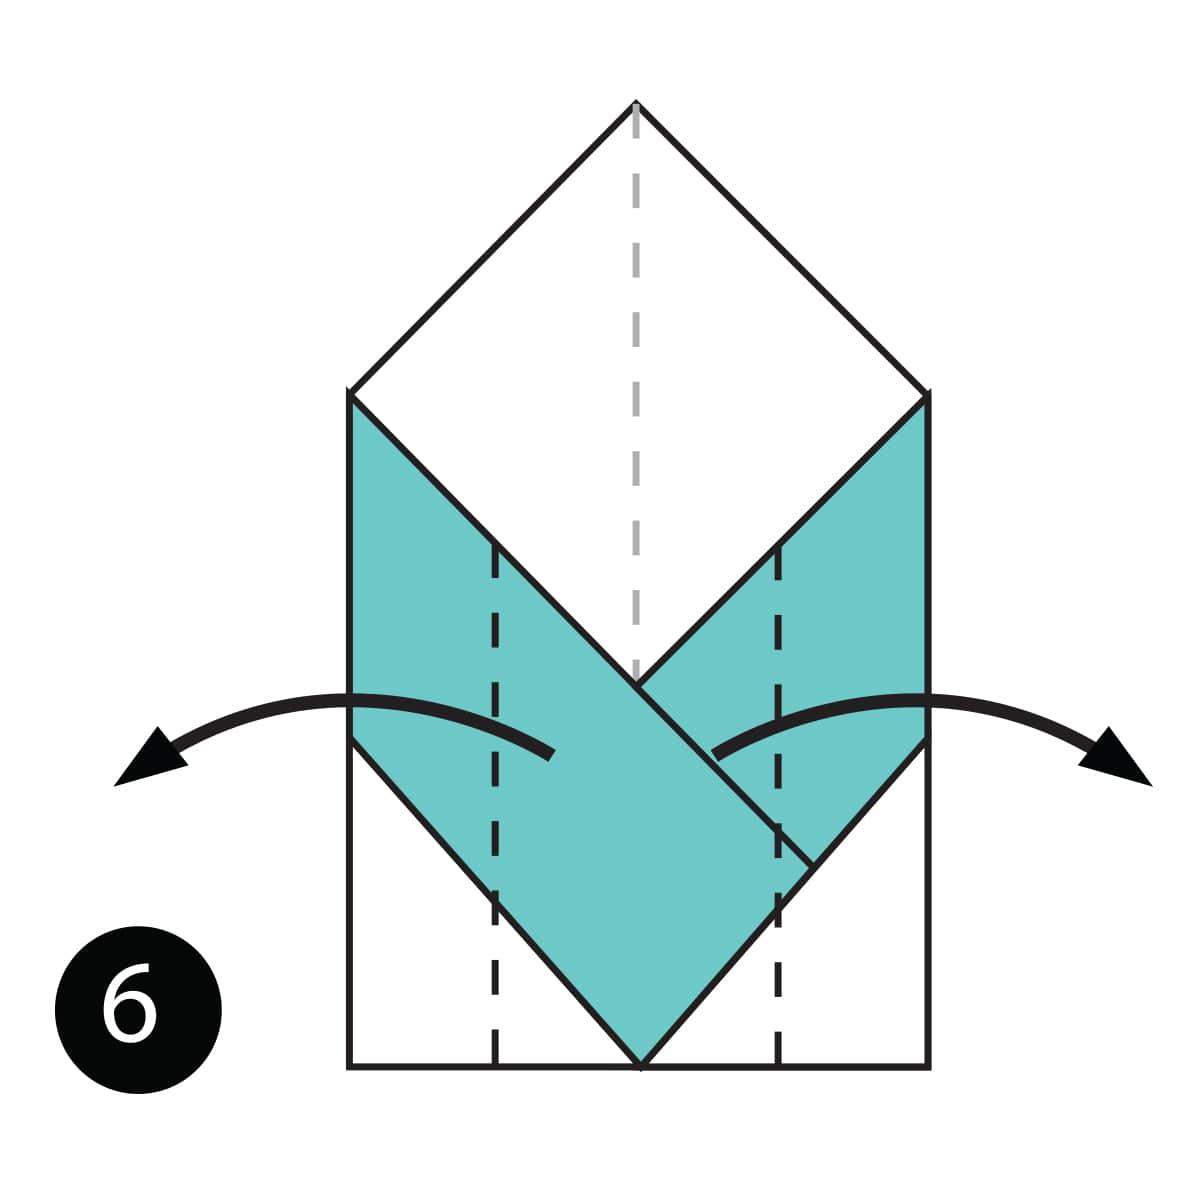 Penguin Baby Step 6